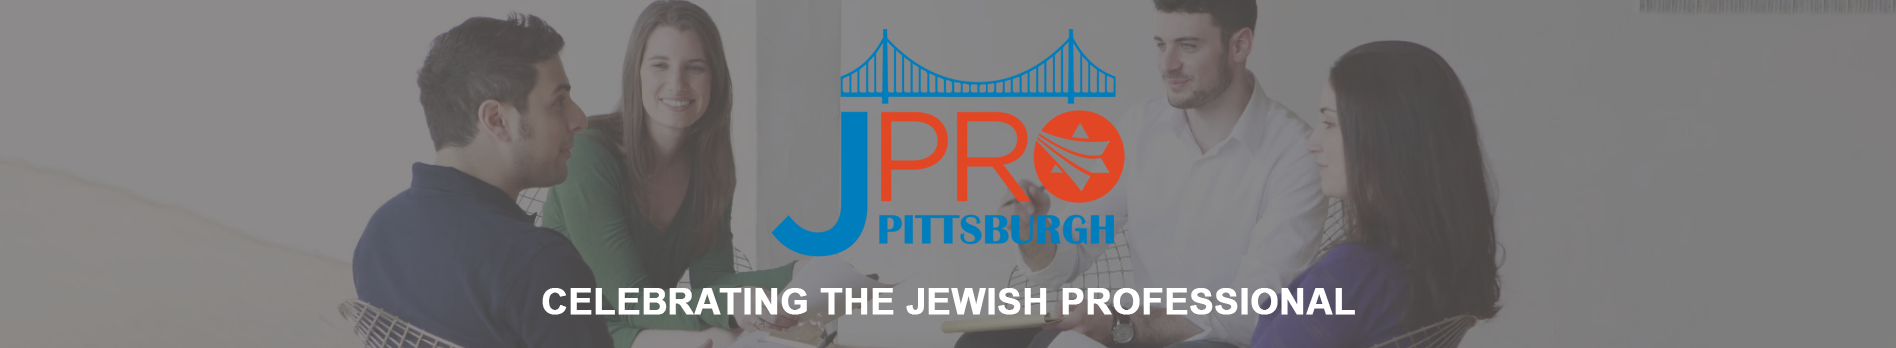 JPRO Pittsburgh